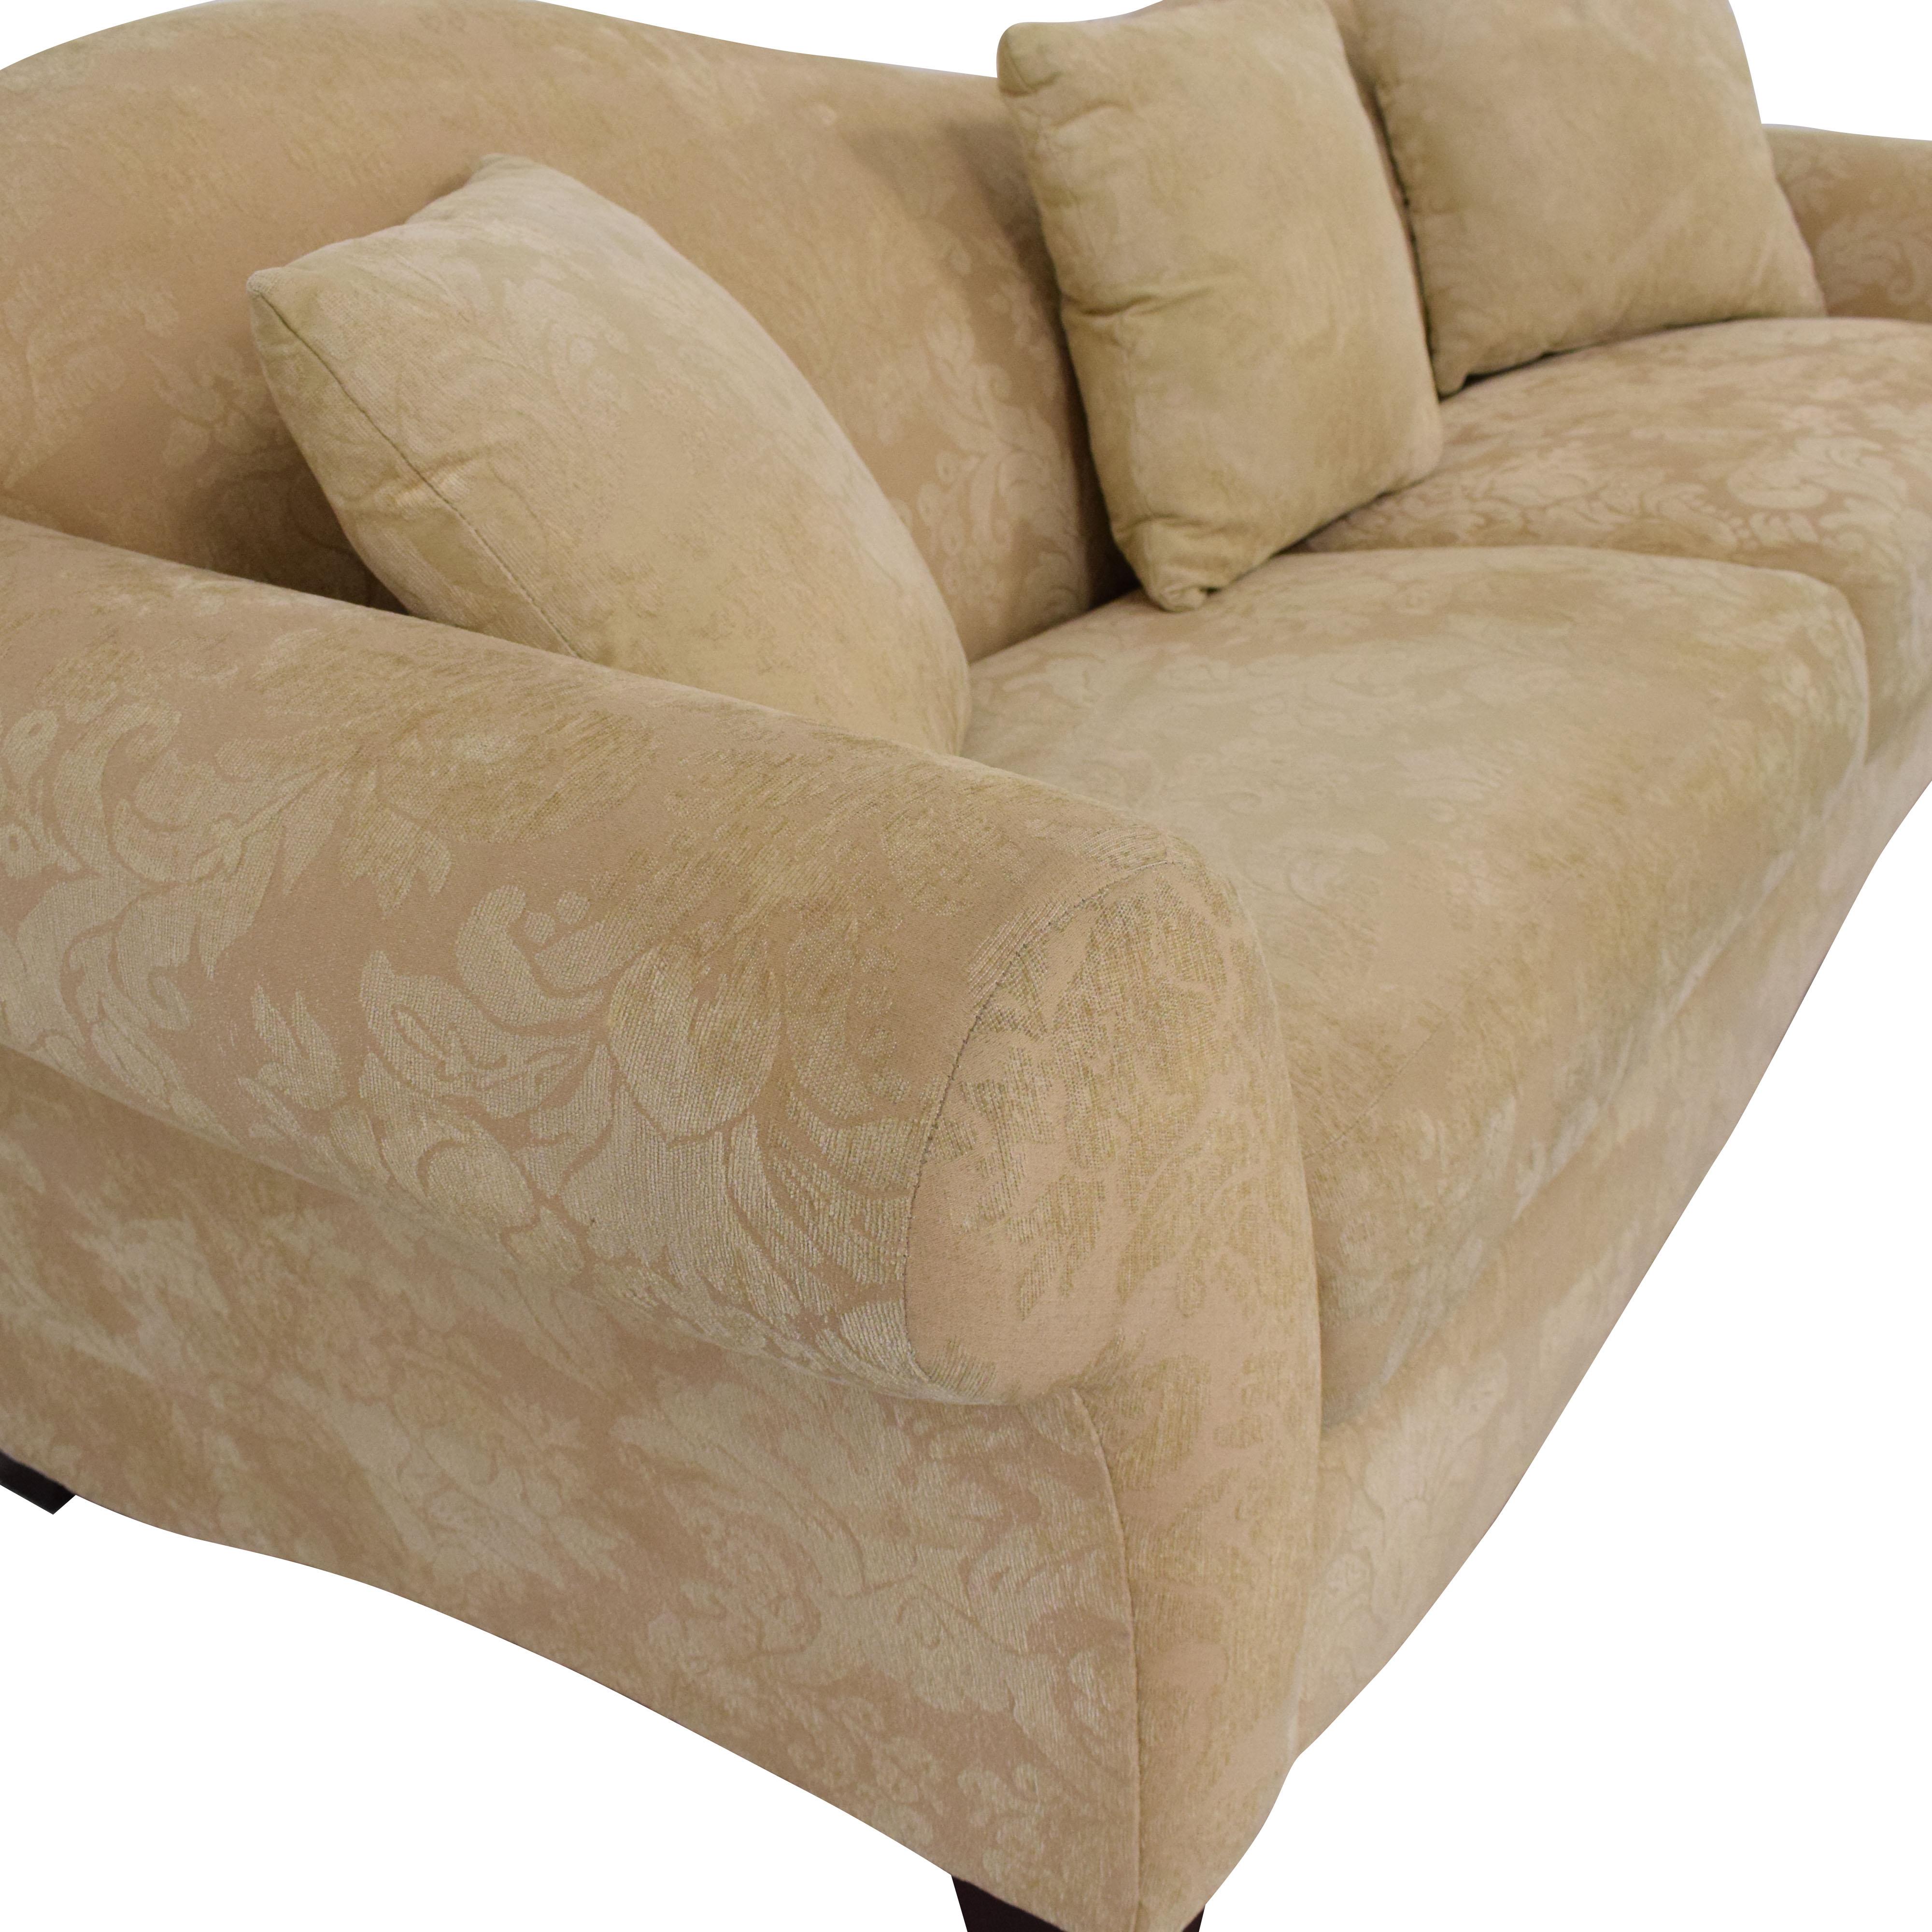 Macy's Macy's Two Cushion Sofa second hand